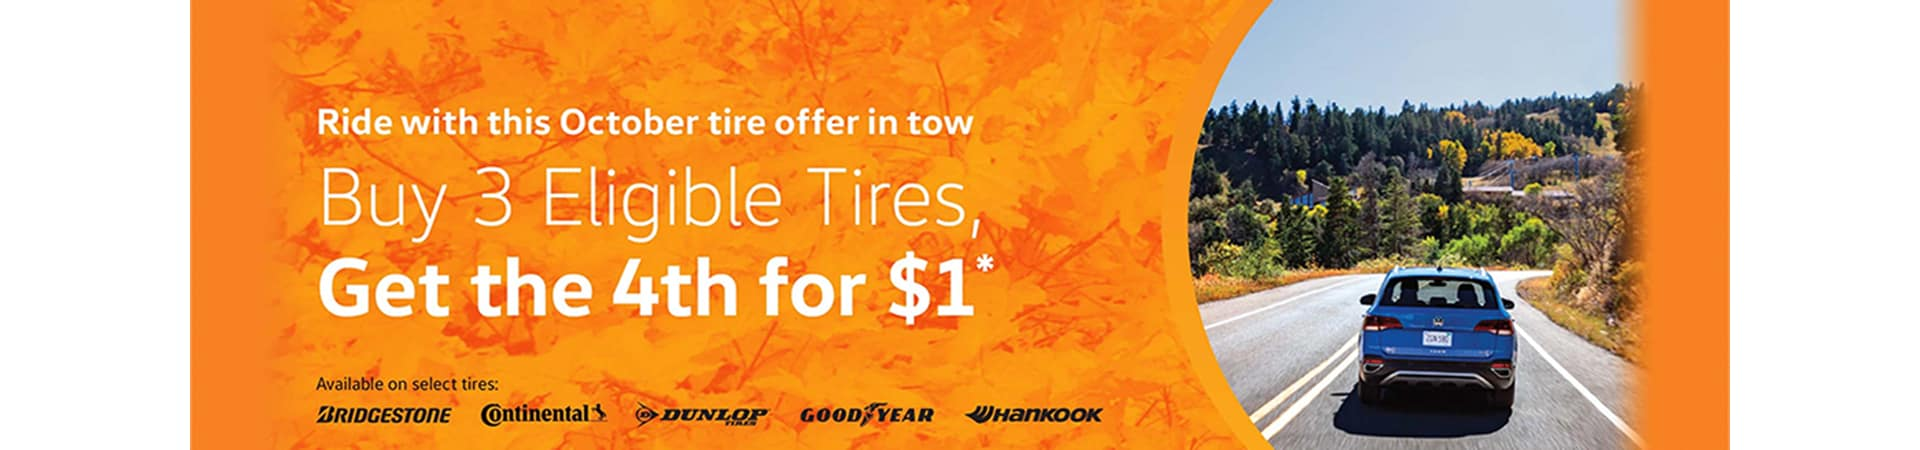 Buy 3 Tire Special